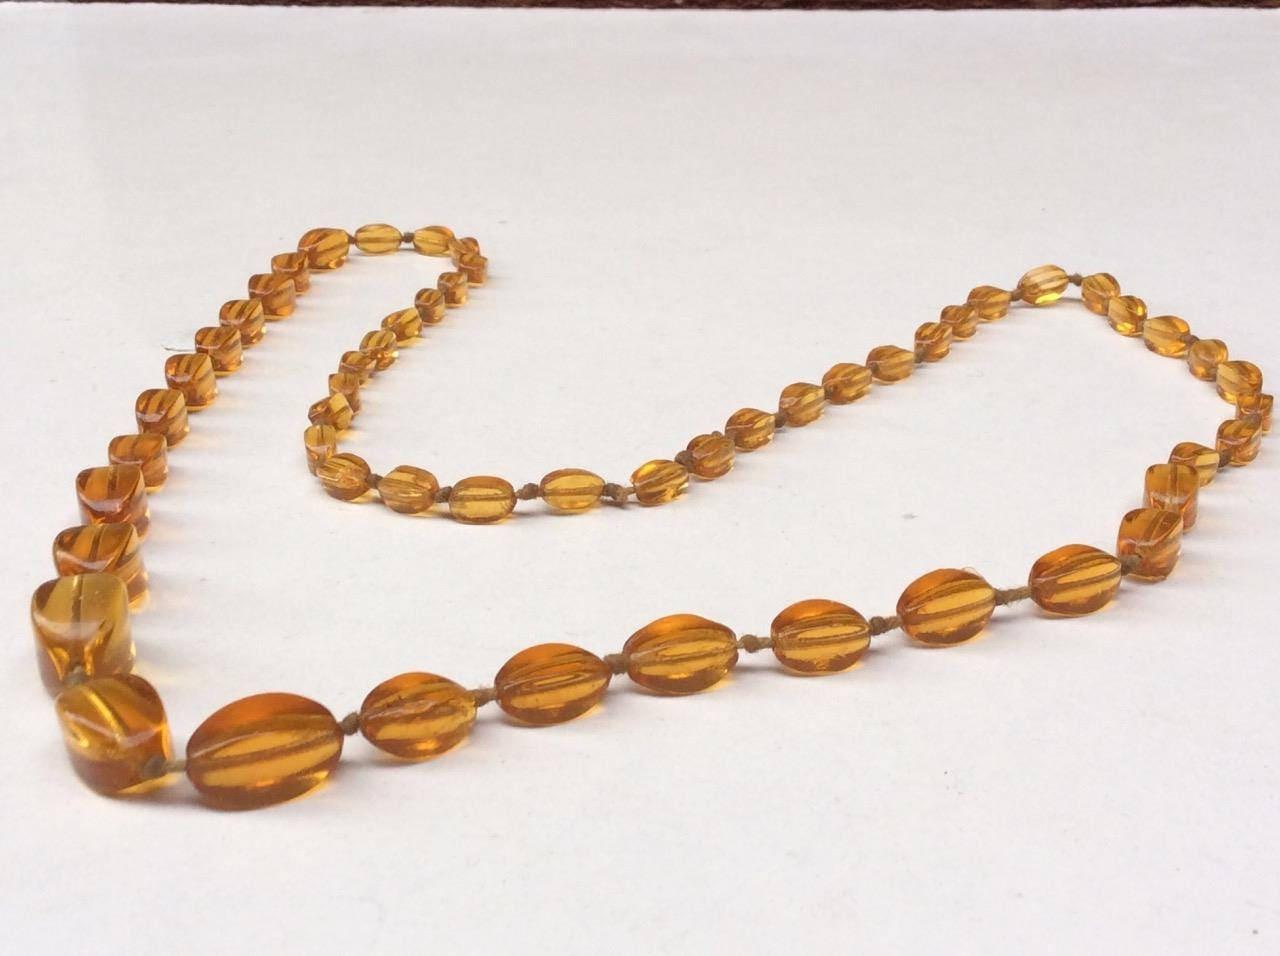 Amber Glass Graduated Flapper Necklace Art Deco Vintage 1930s  1950s